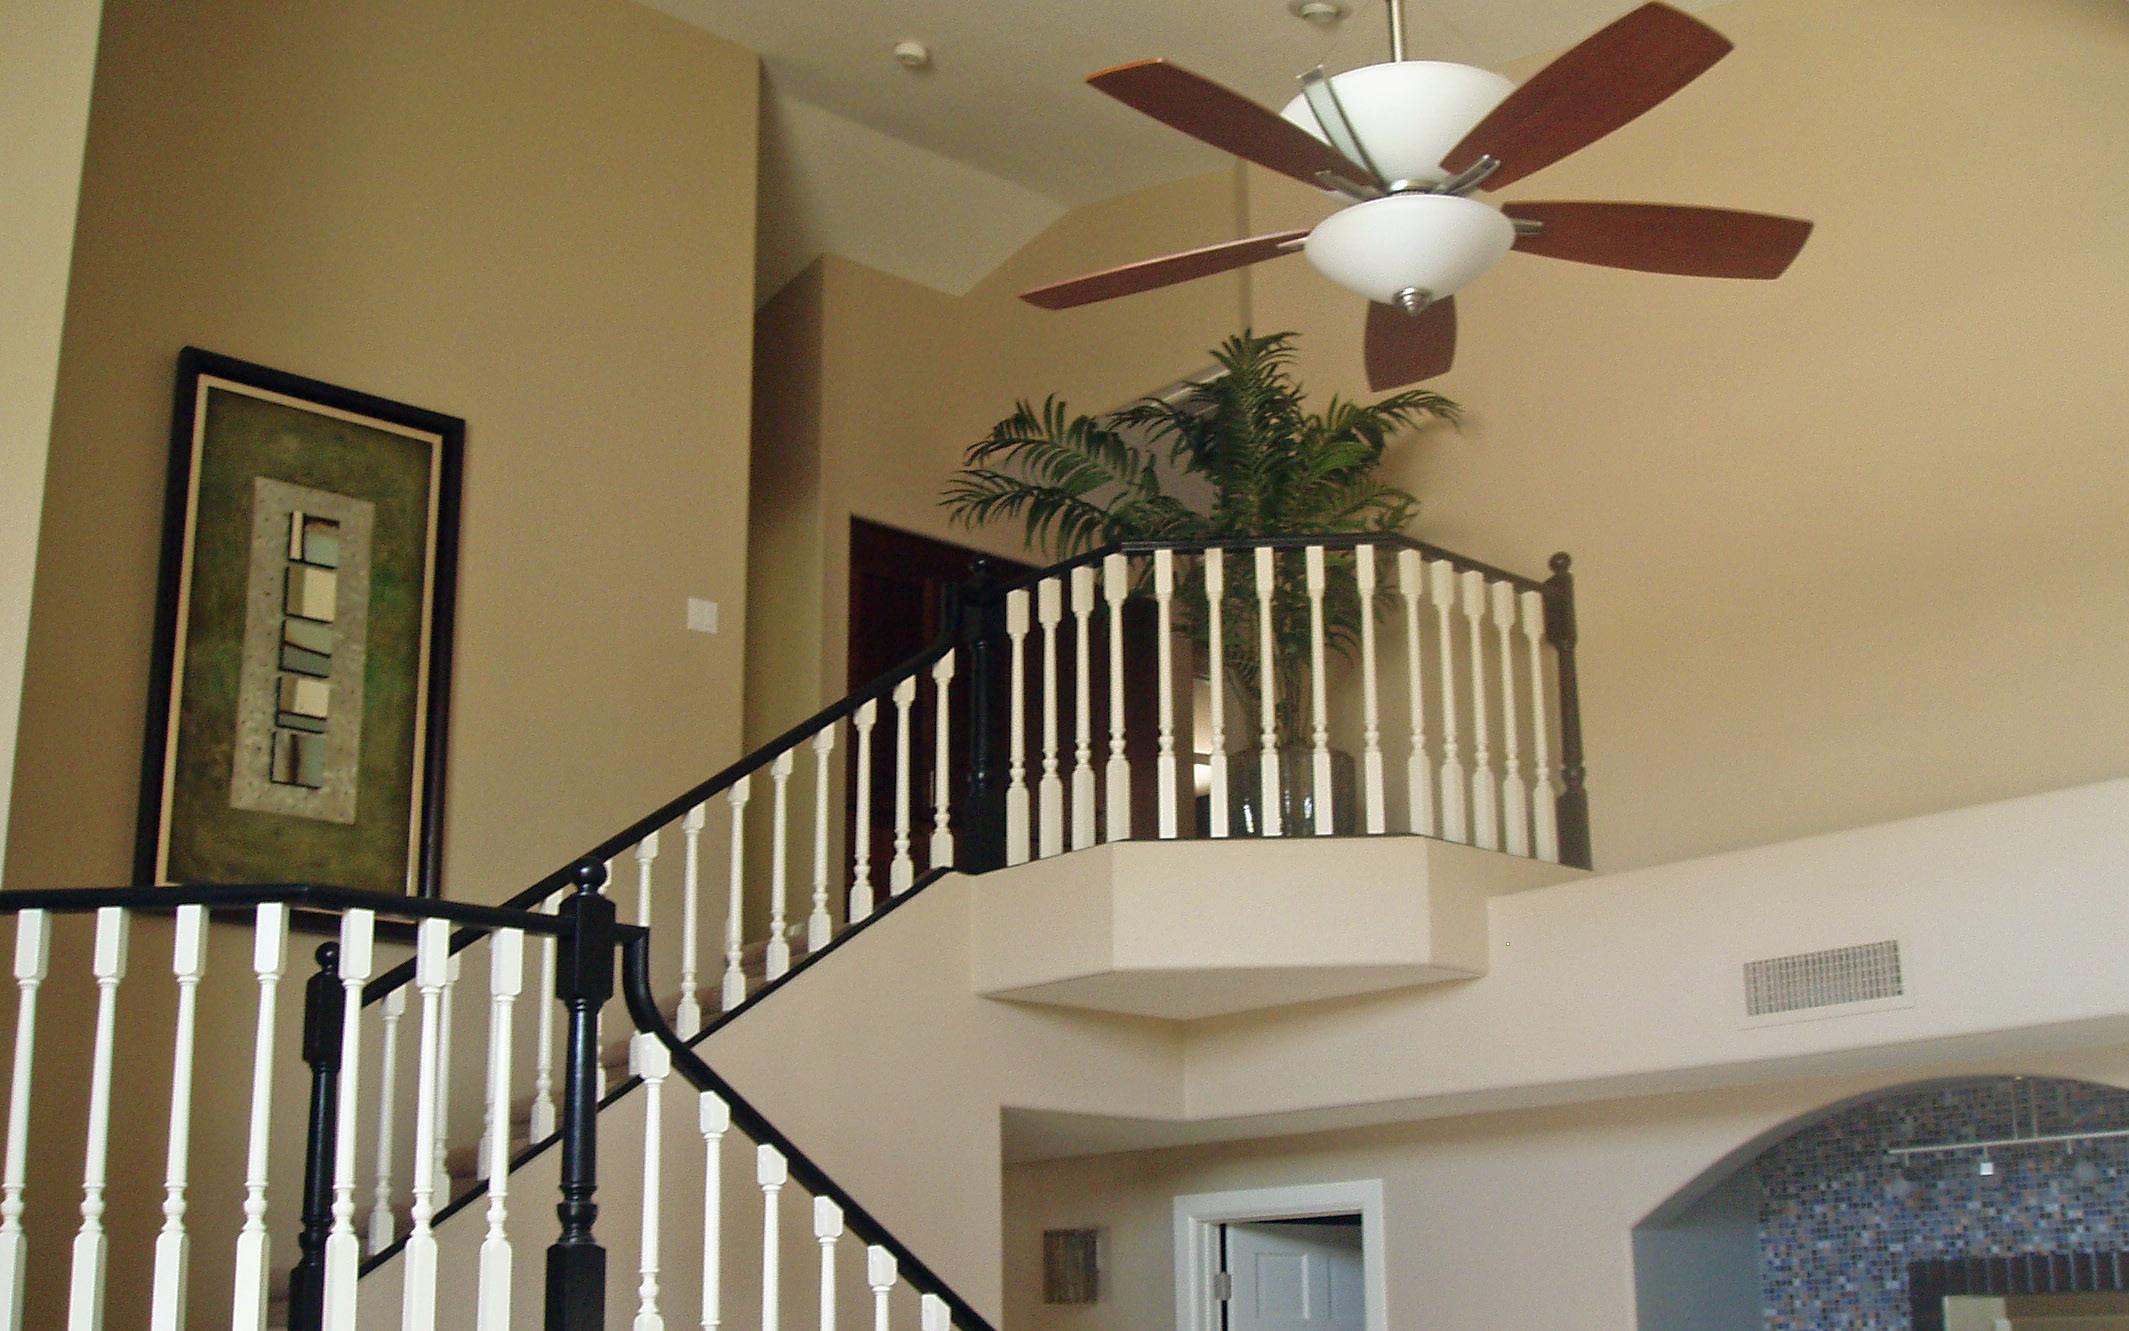 Stairwell After Art & Accessories